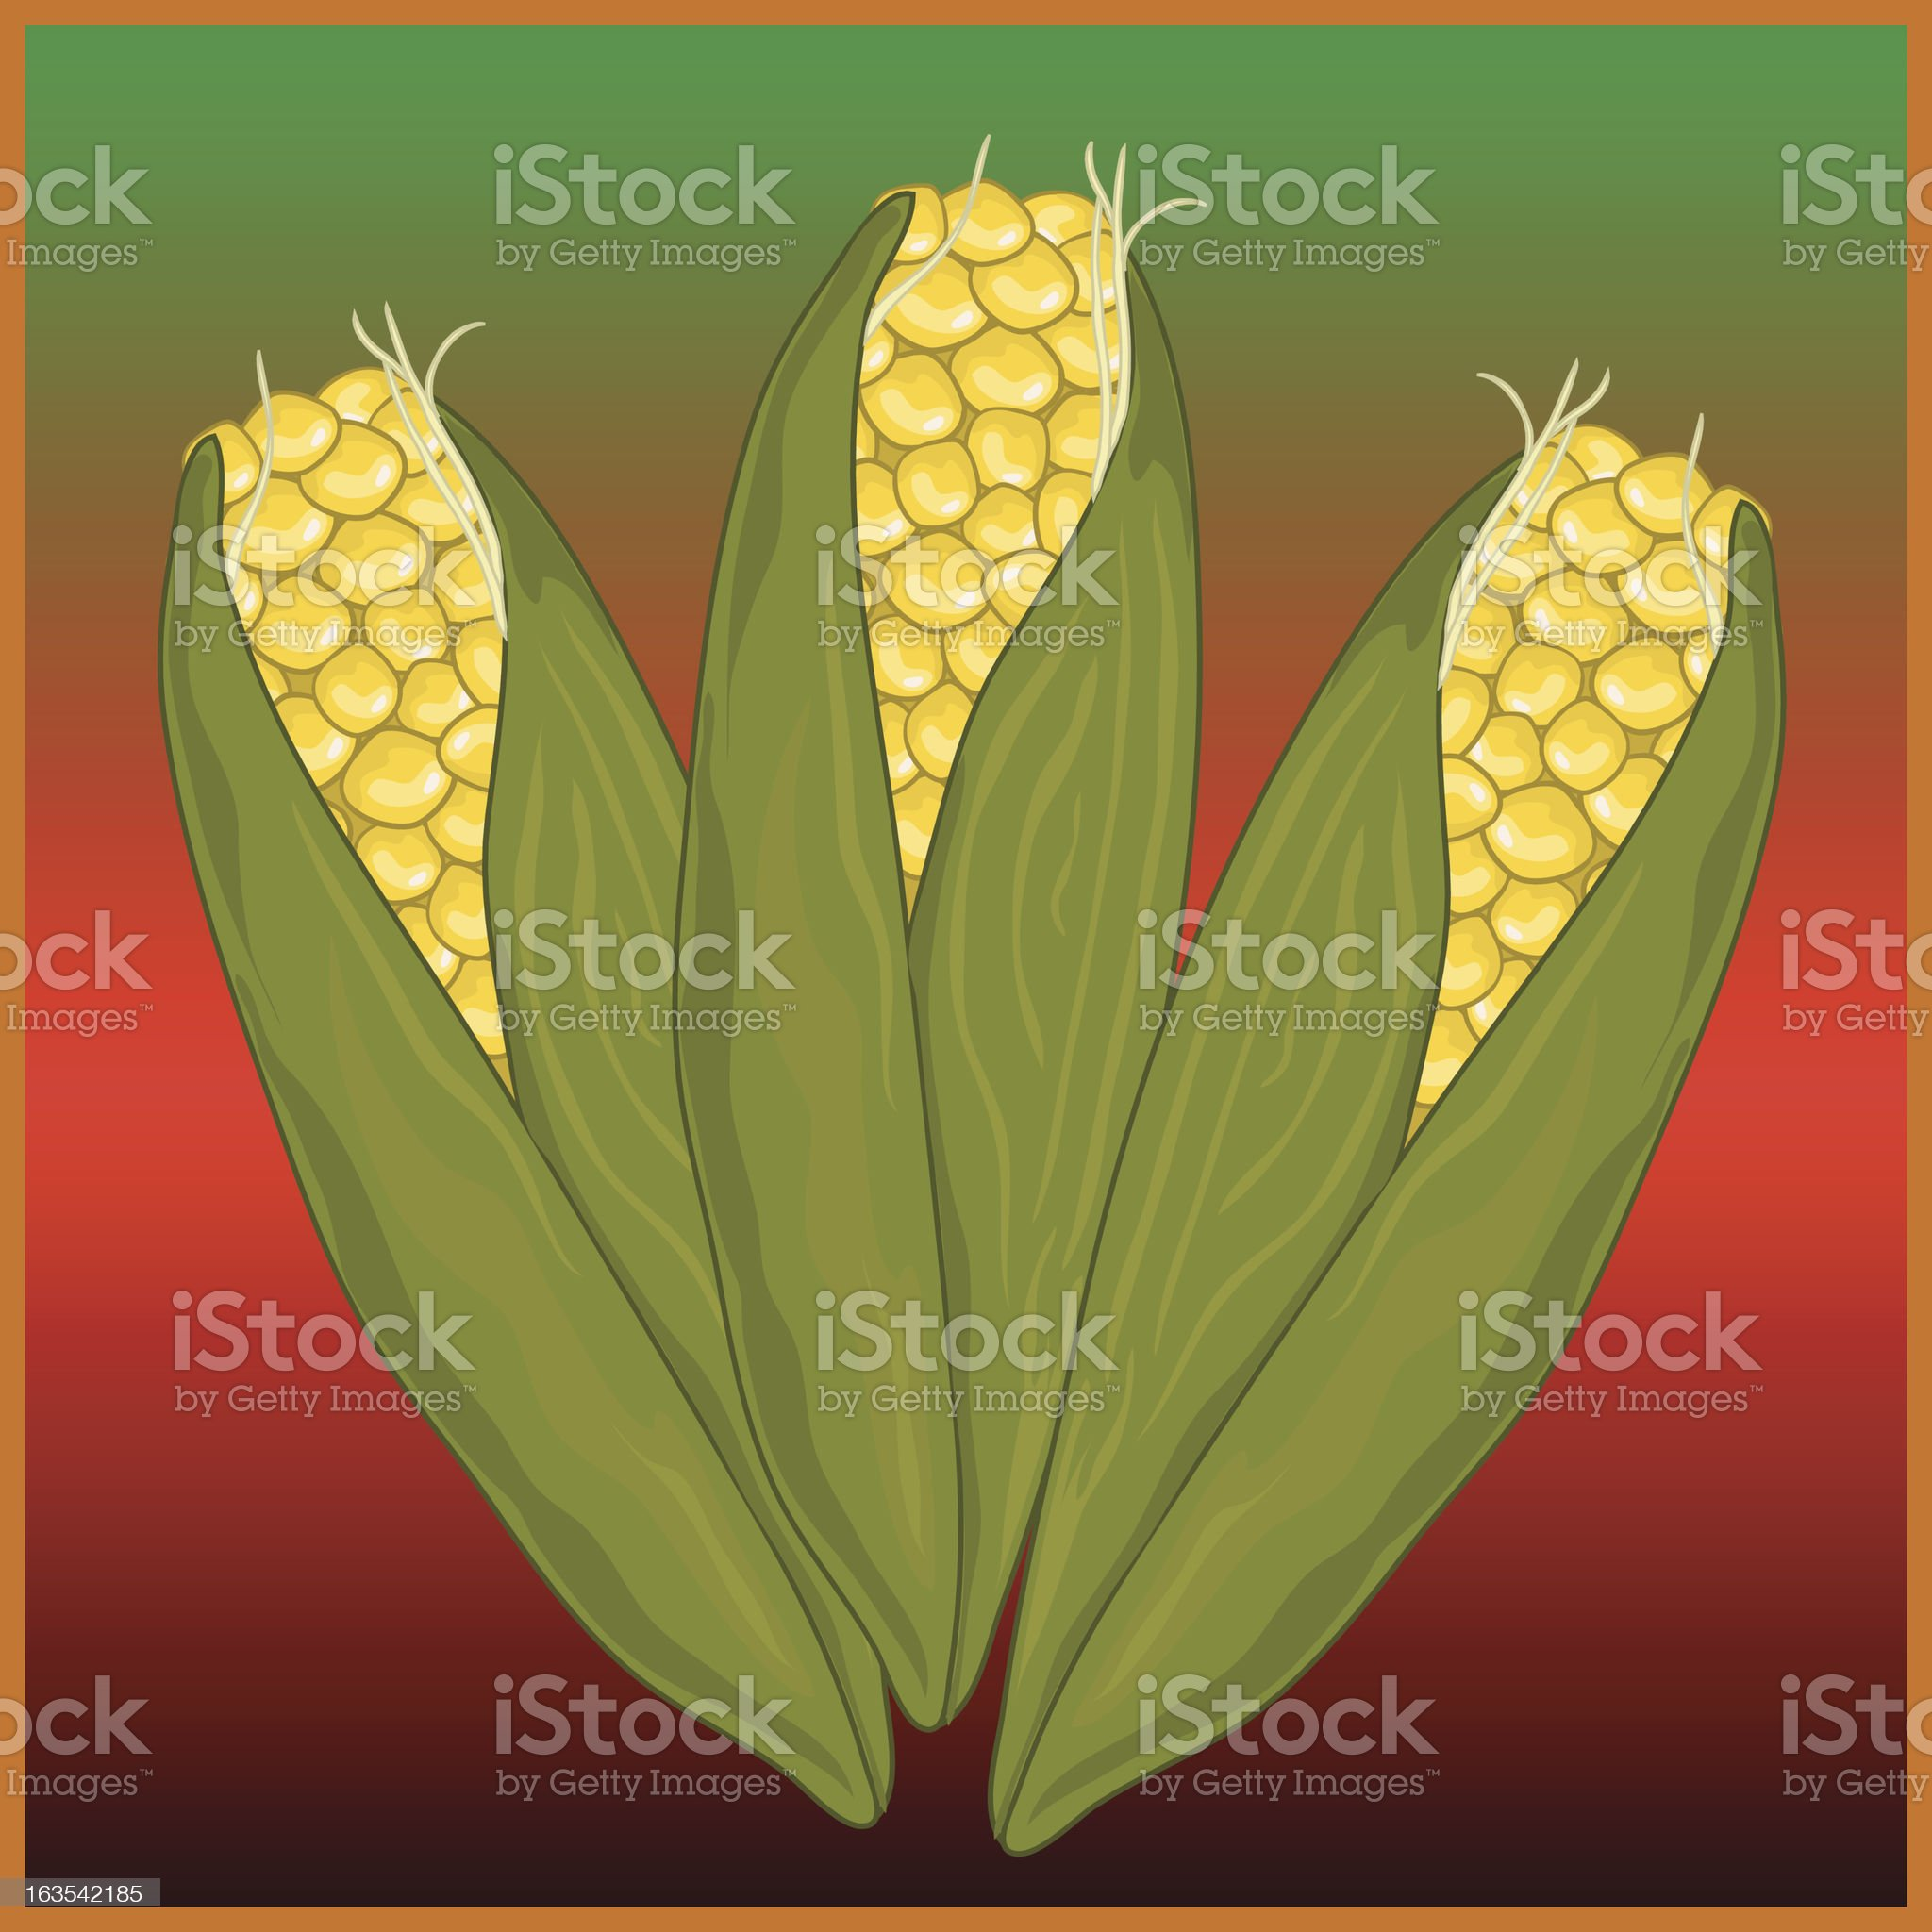 Kwanza Corn royalty-free stock vector art